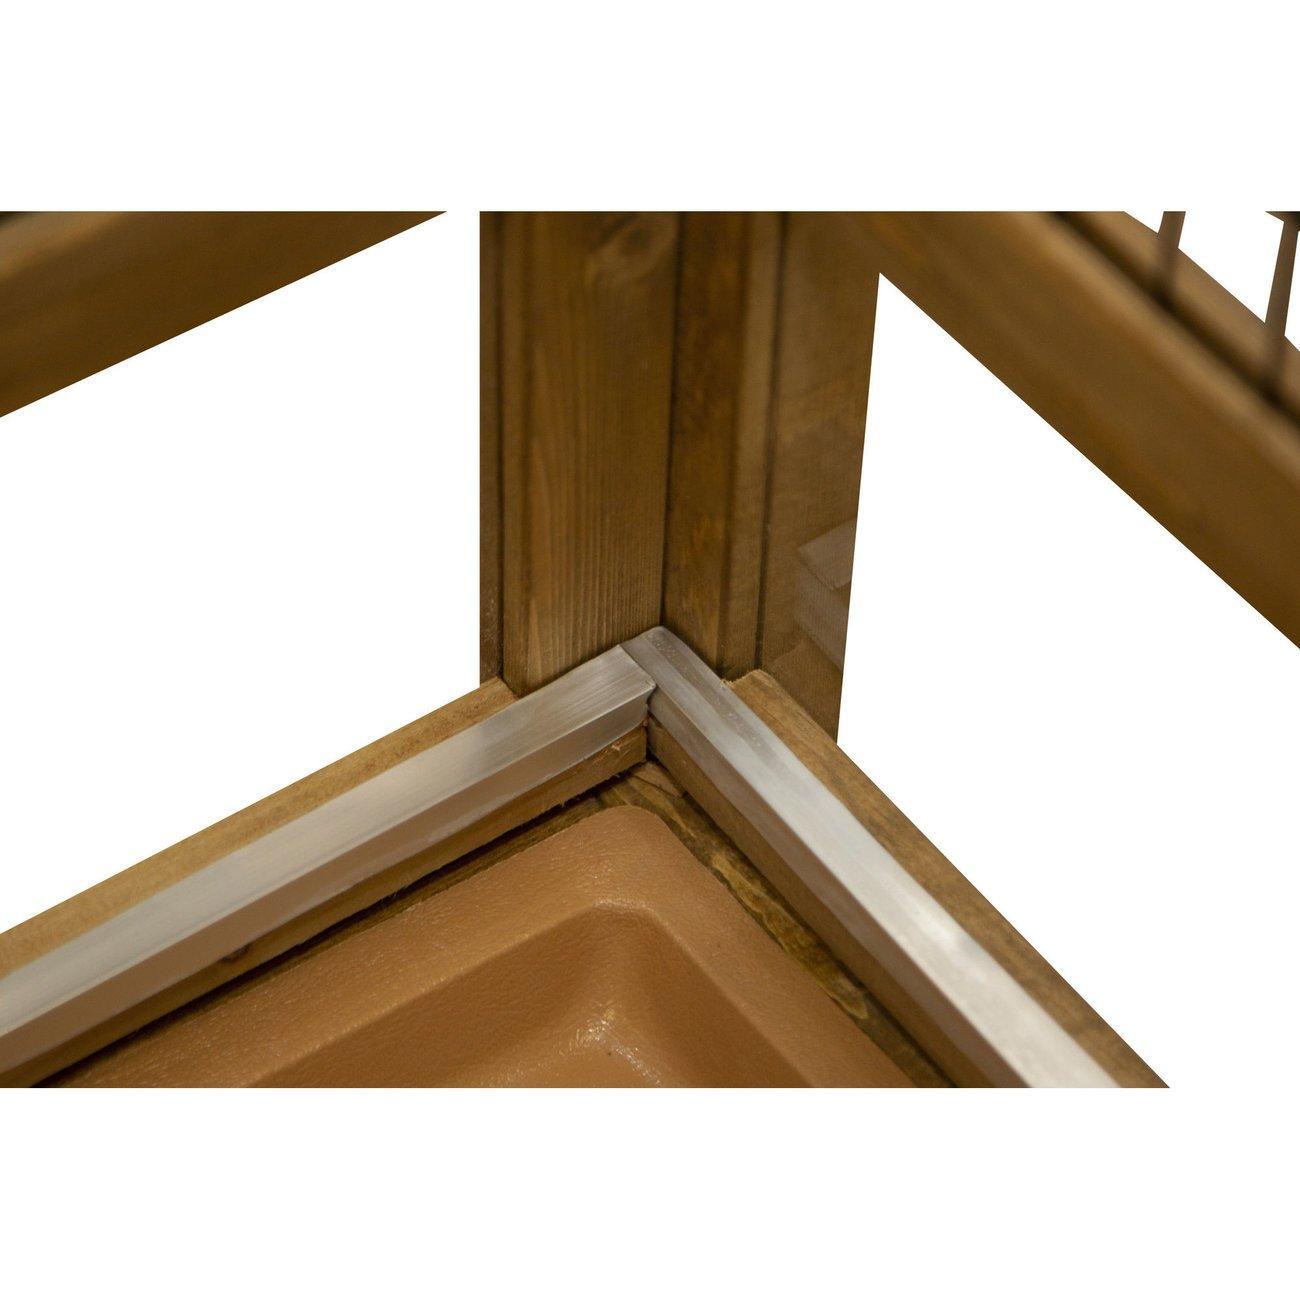 Kerbl Kleintierkäfig Indoor Space, Bild 4